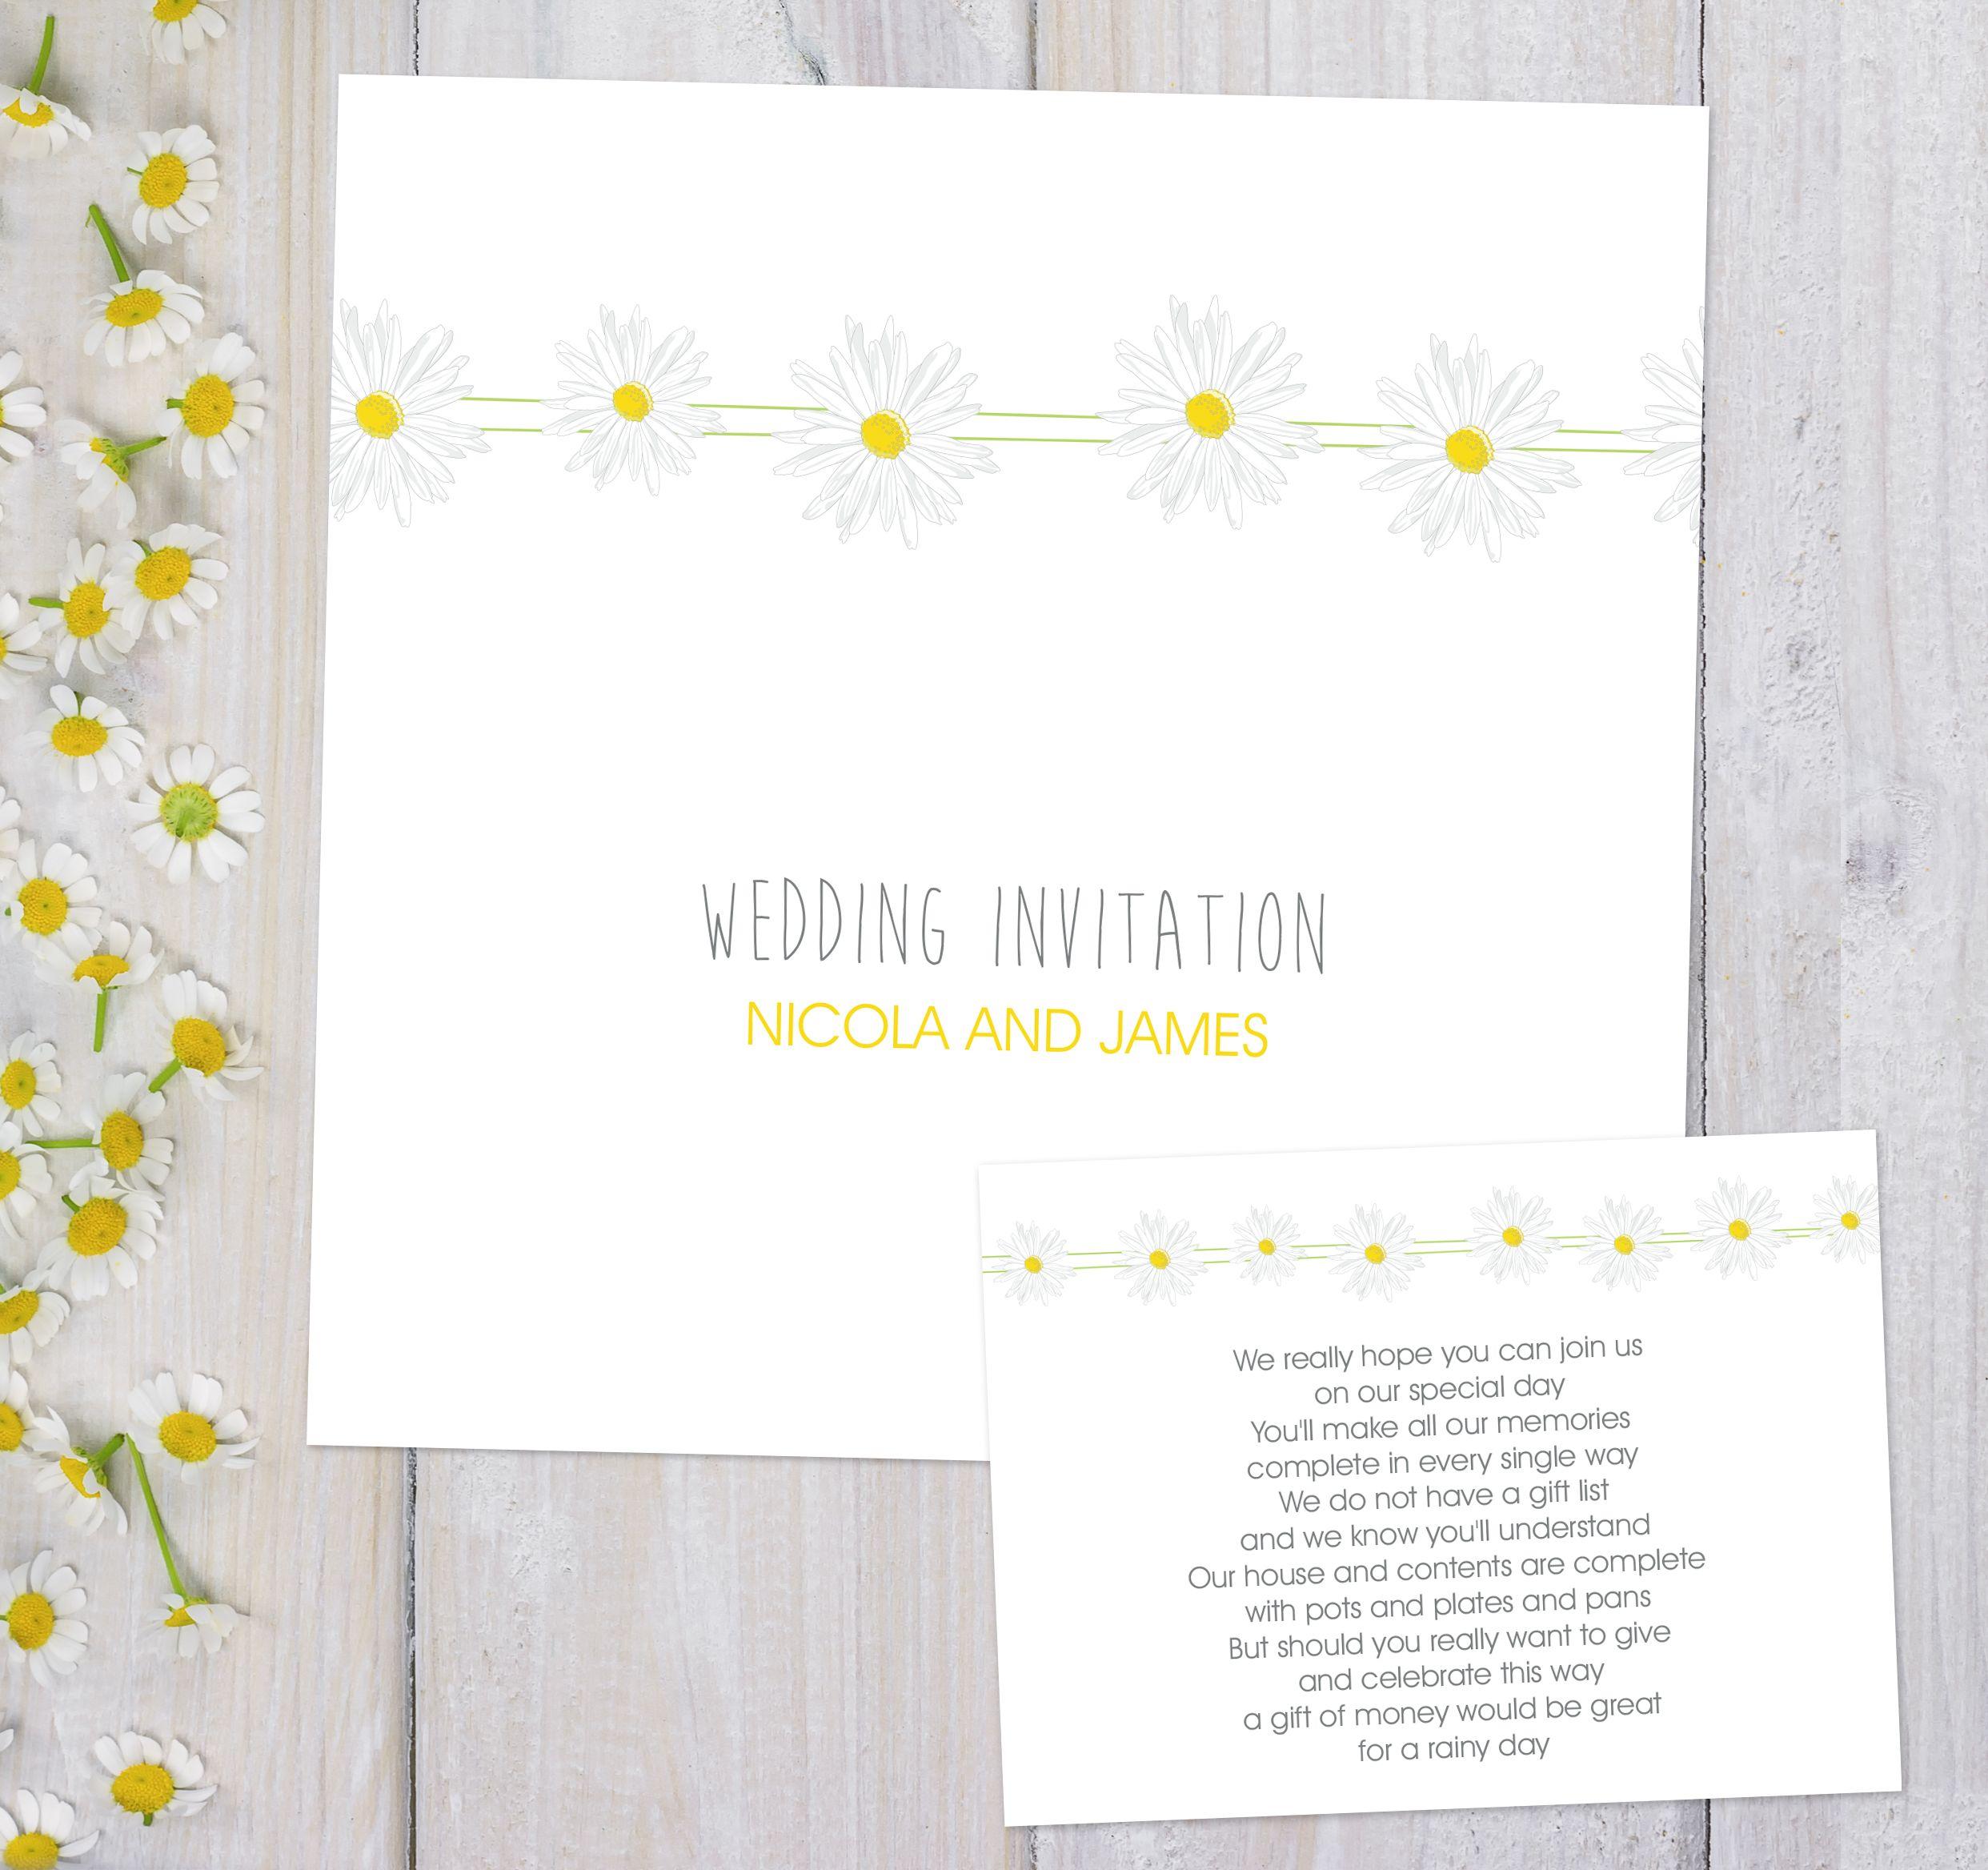 Daisy Chain Day Invitation Daisy Chain Weddings And Wedding